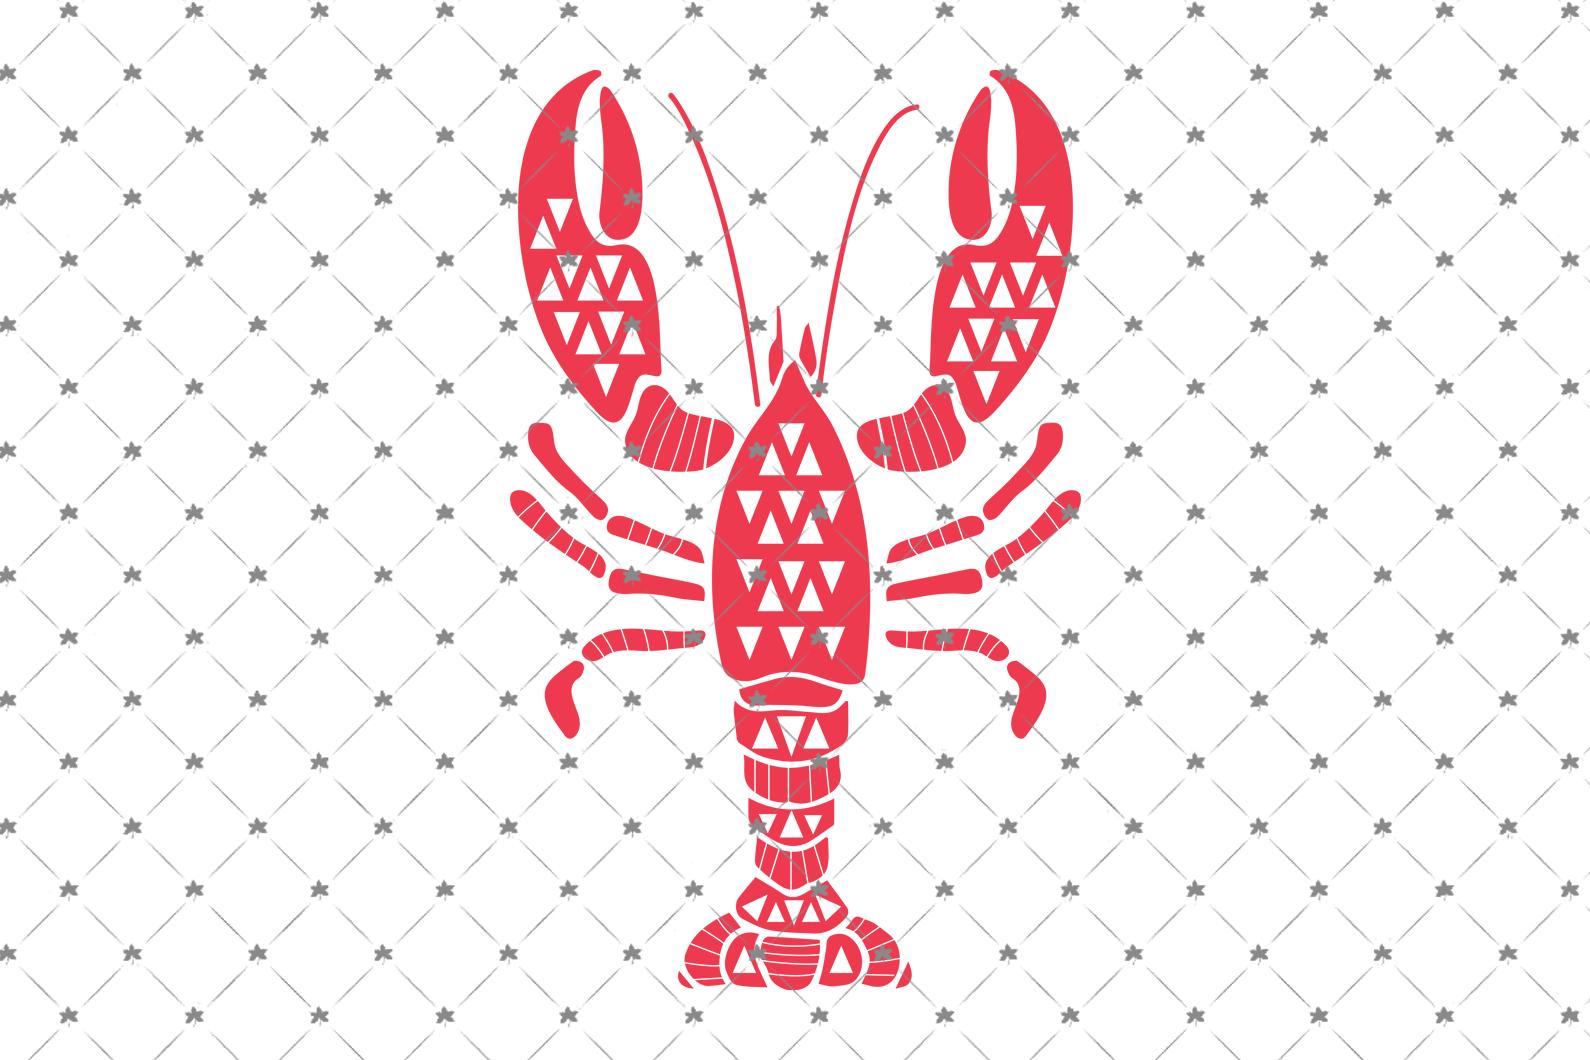 Red Lobsters Lobsters Svg Lobsters By Jonnygoody On Zibbet